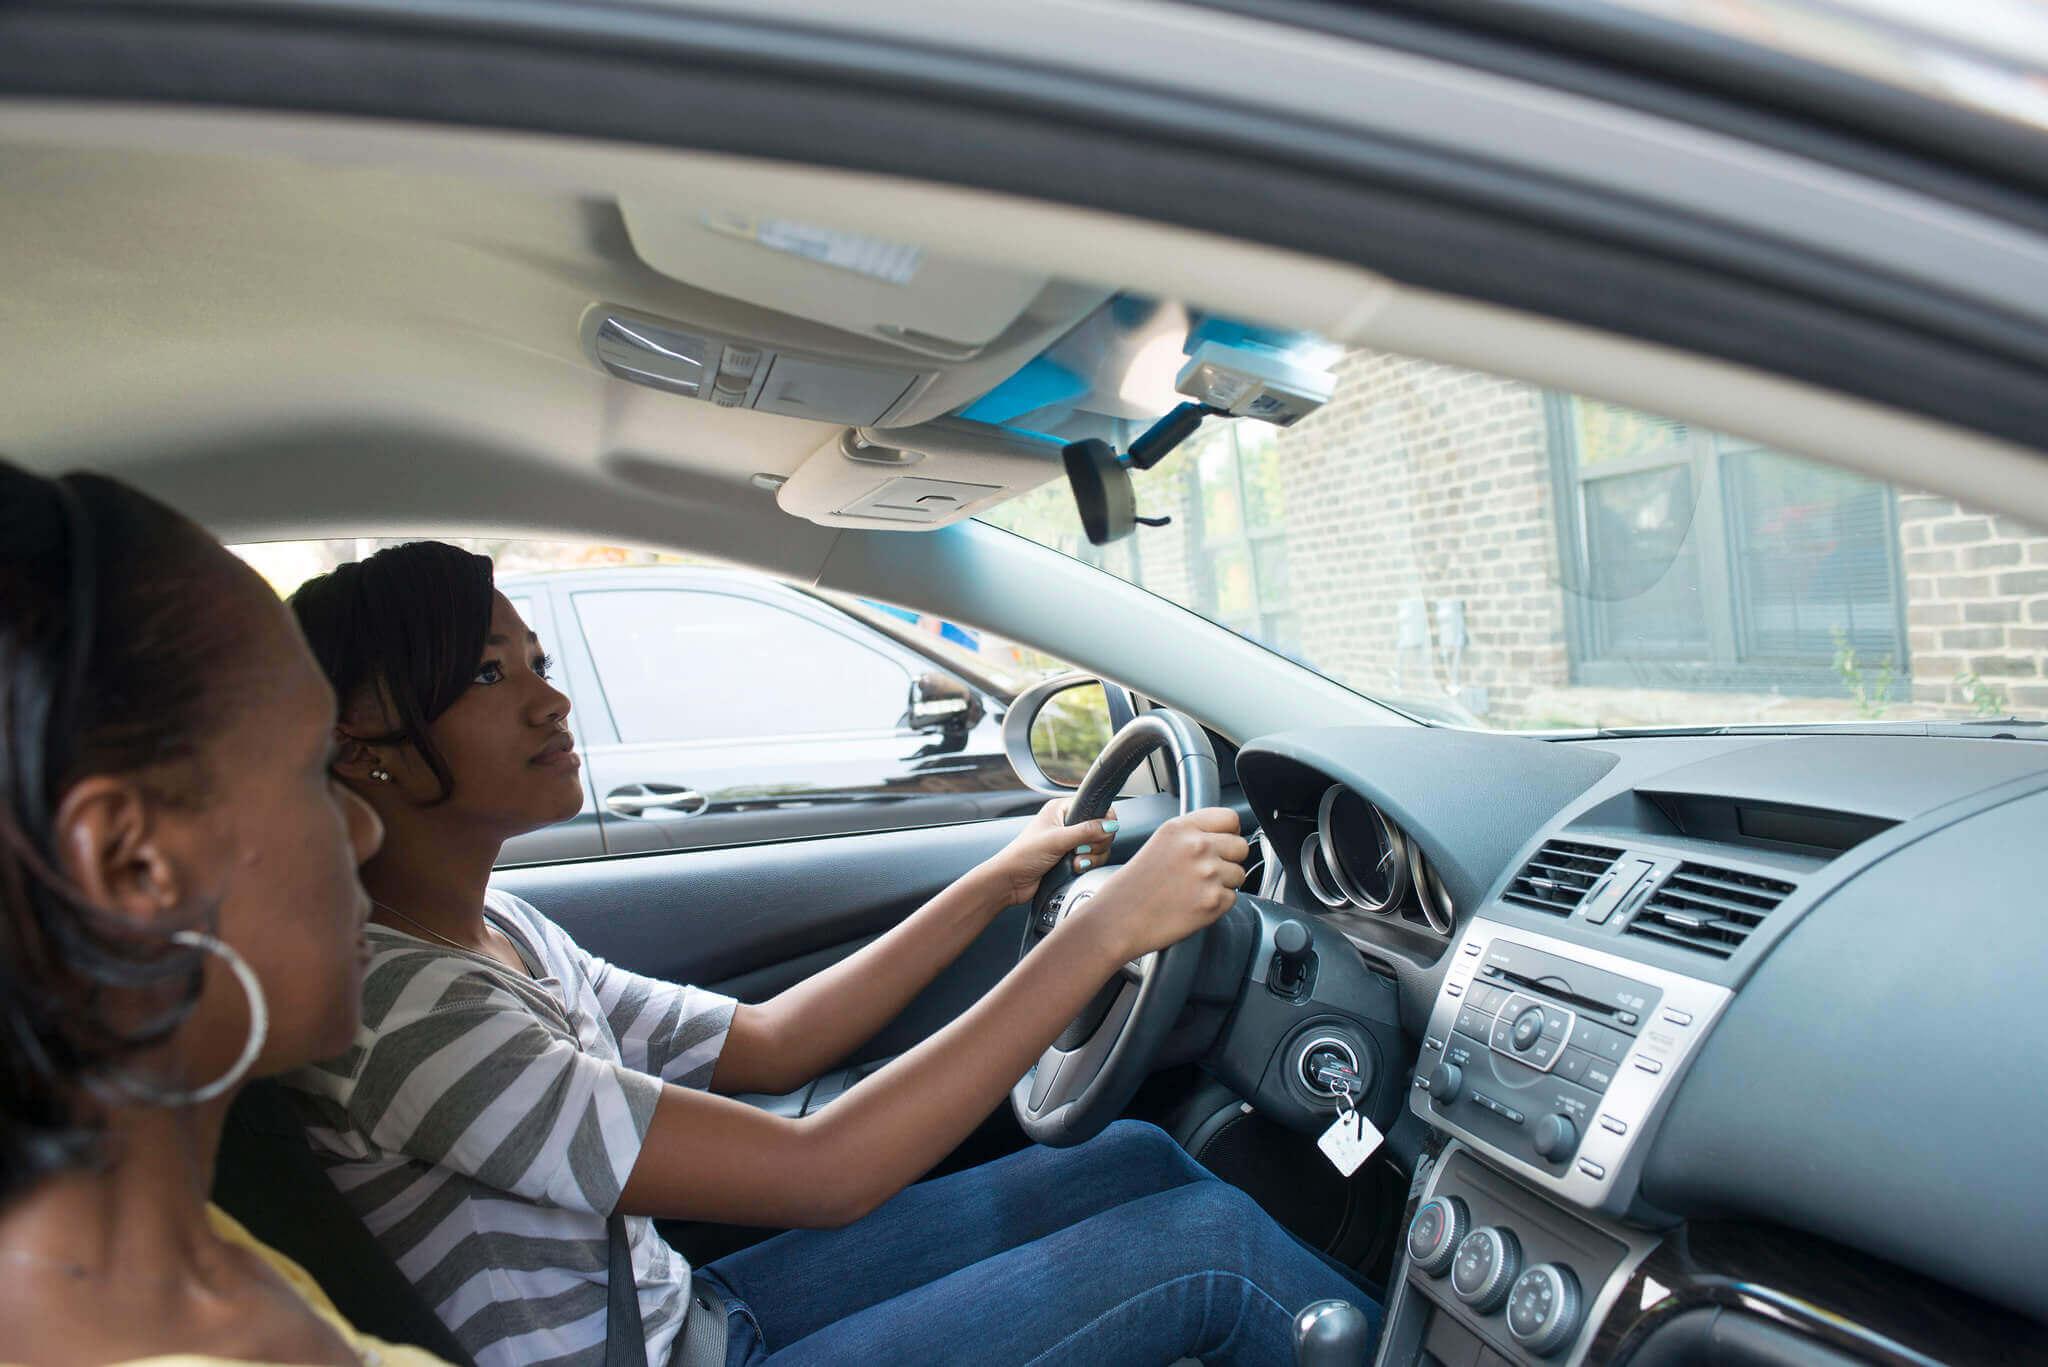 Two women sitting in a car